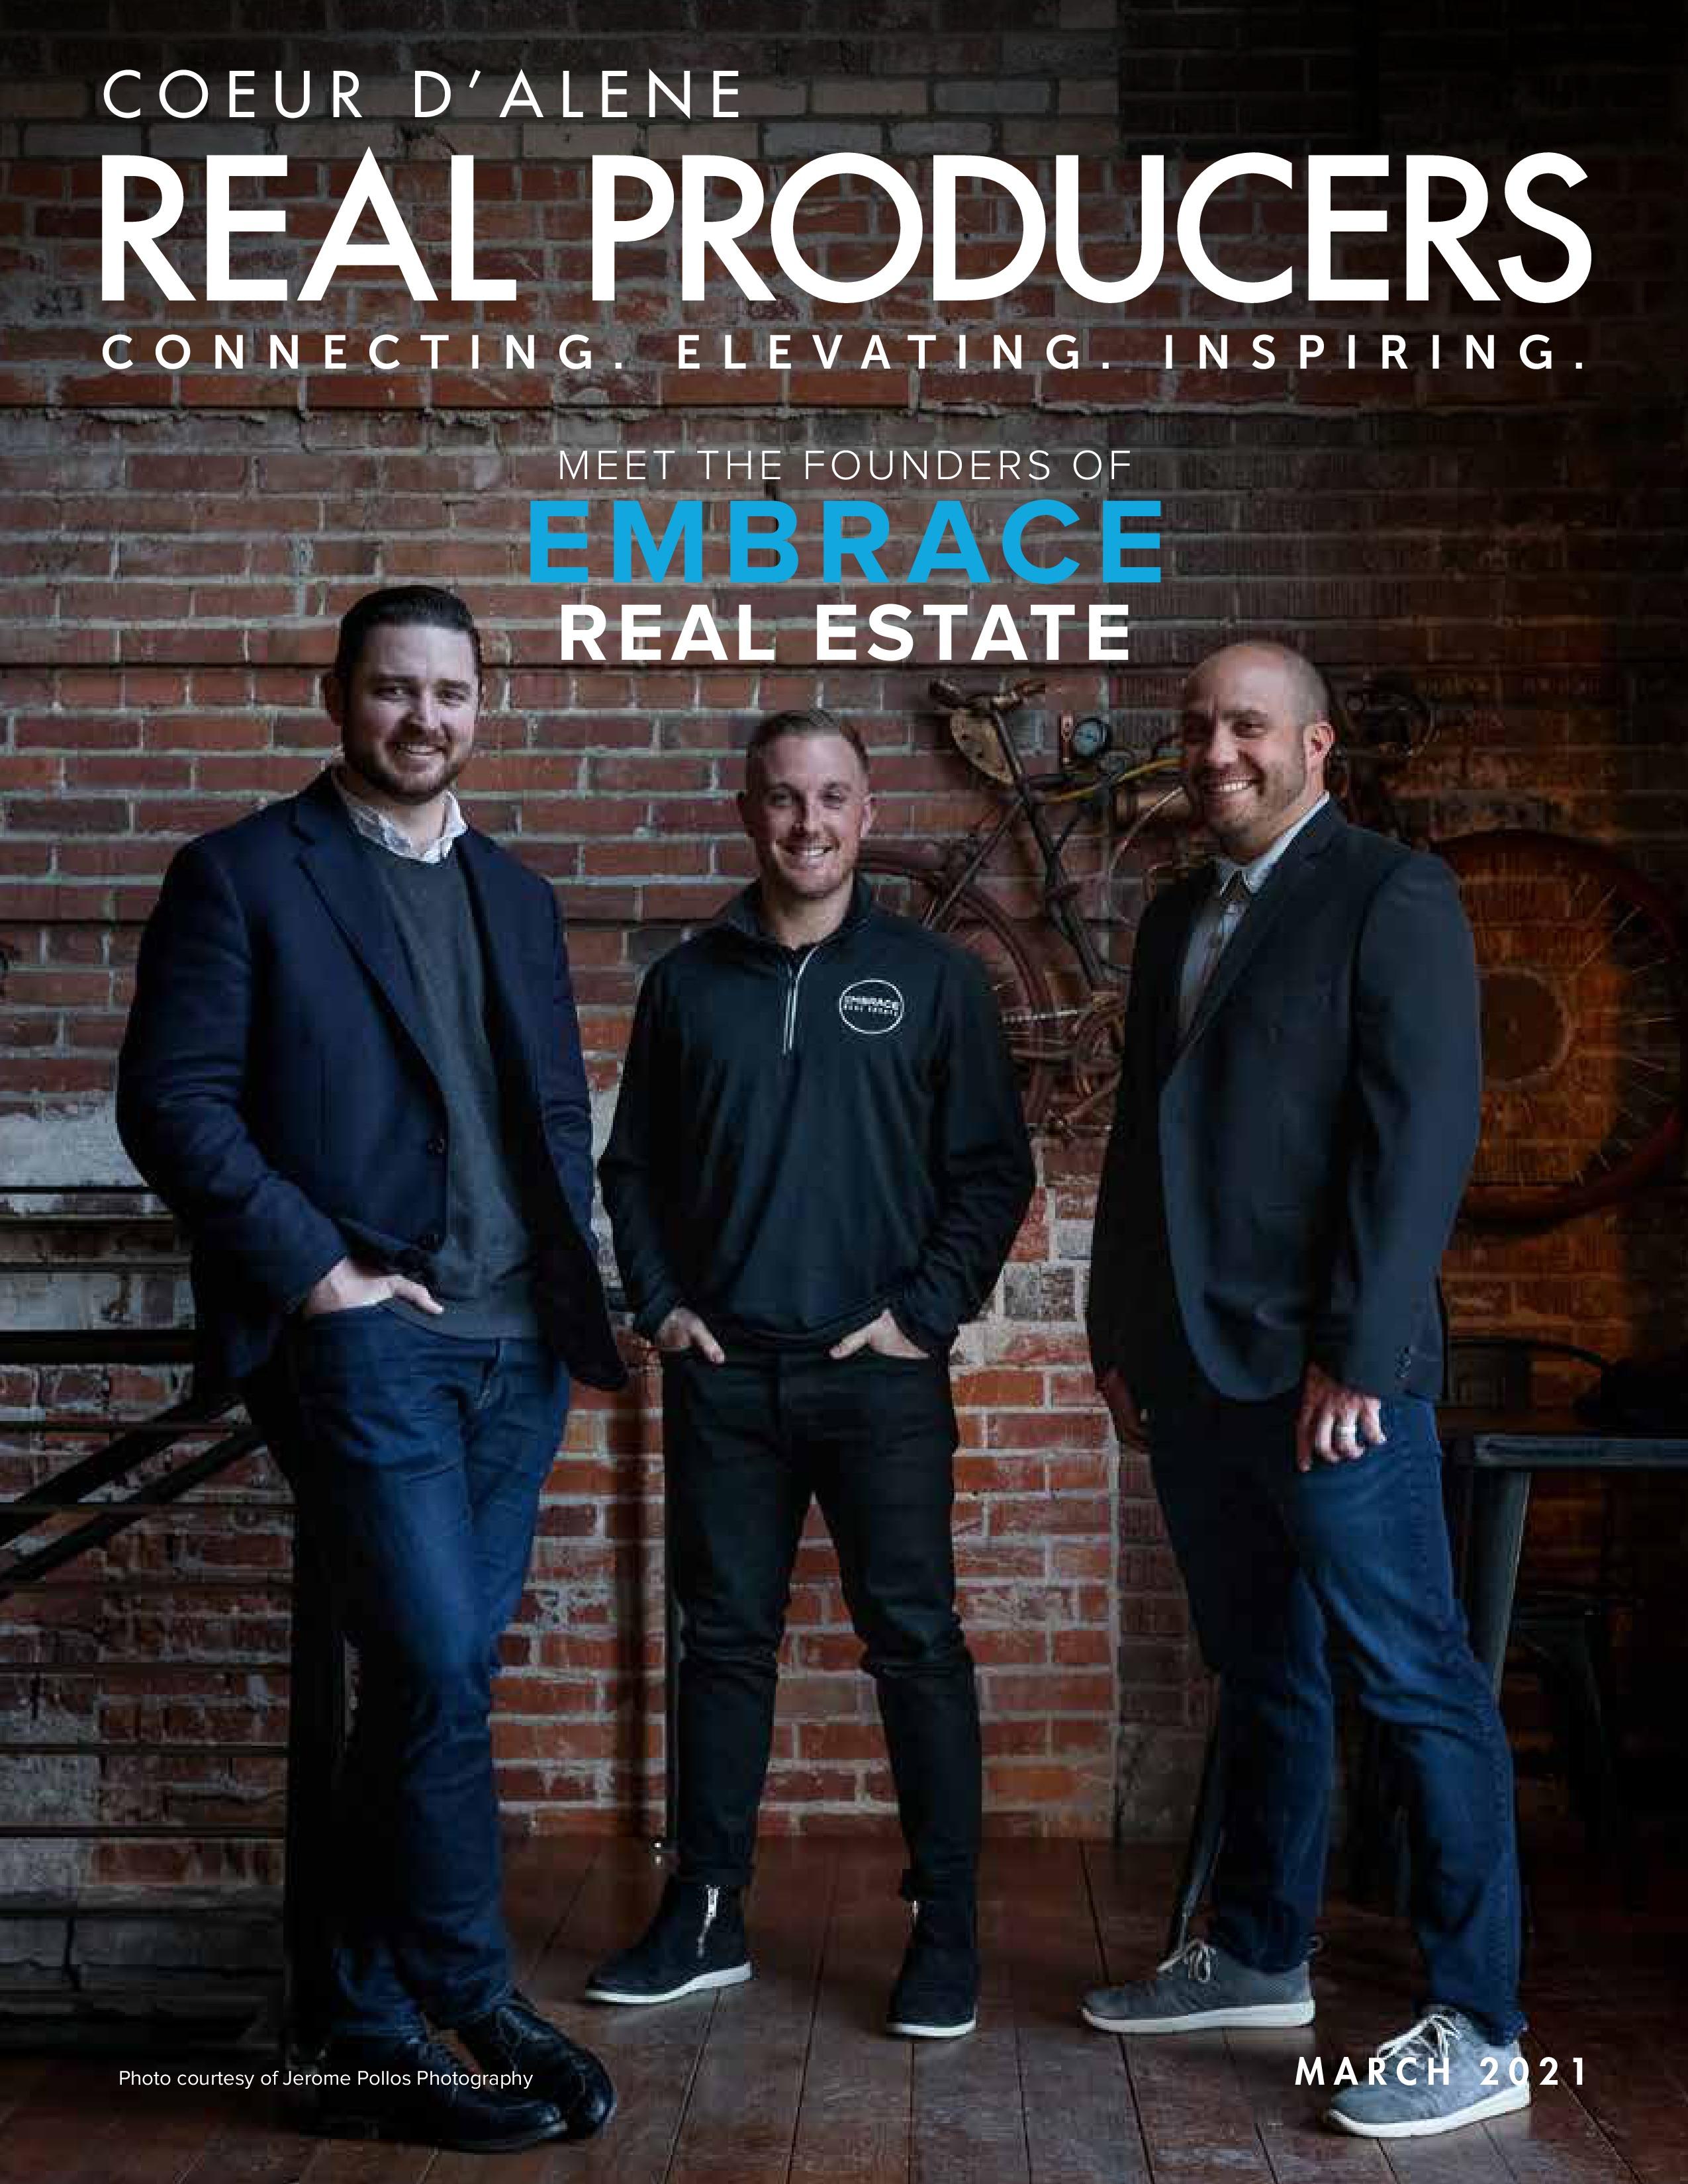 Coeur D'Alene Real Producers 2021-03-01